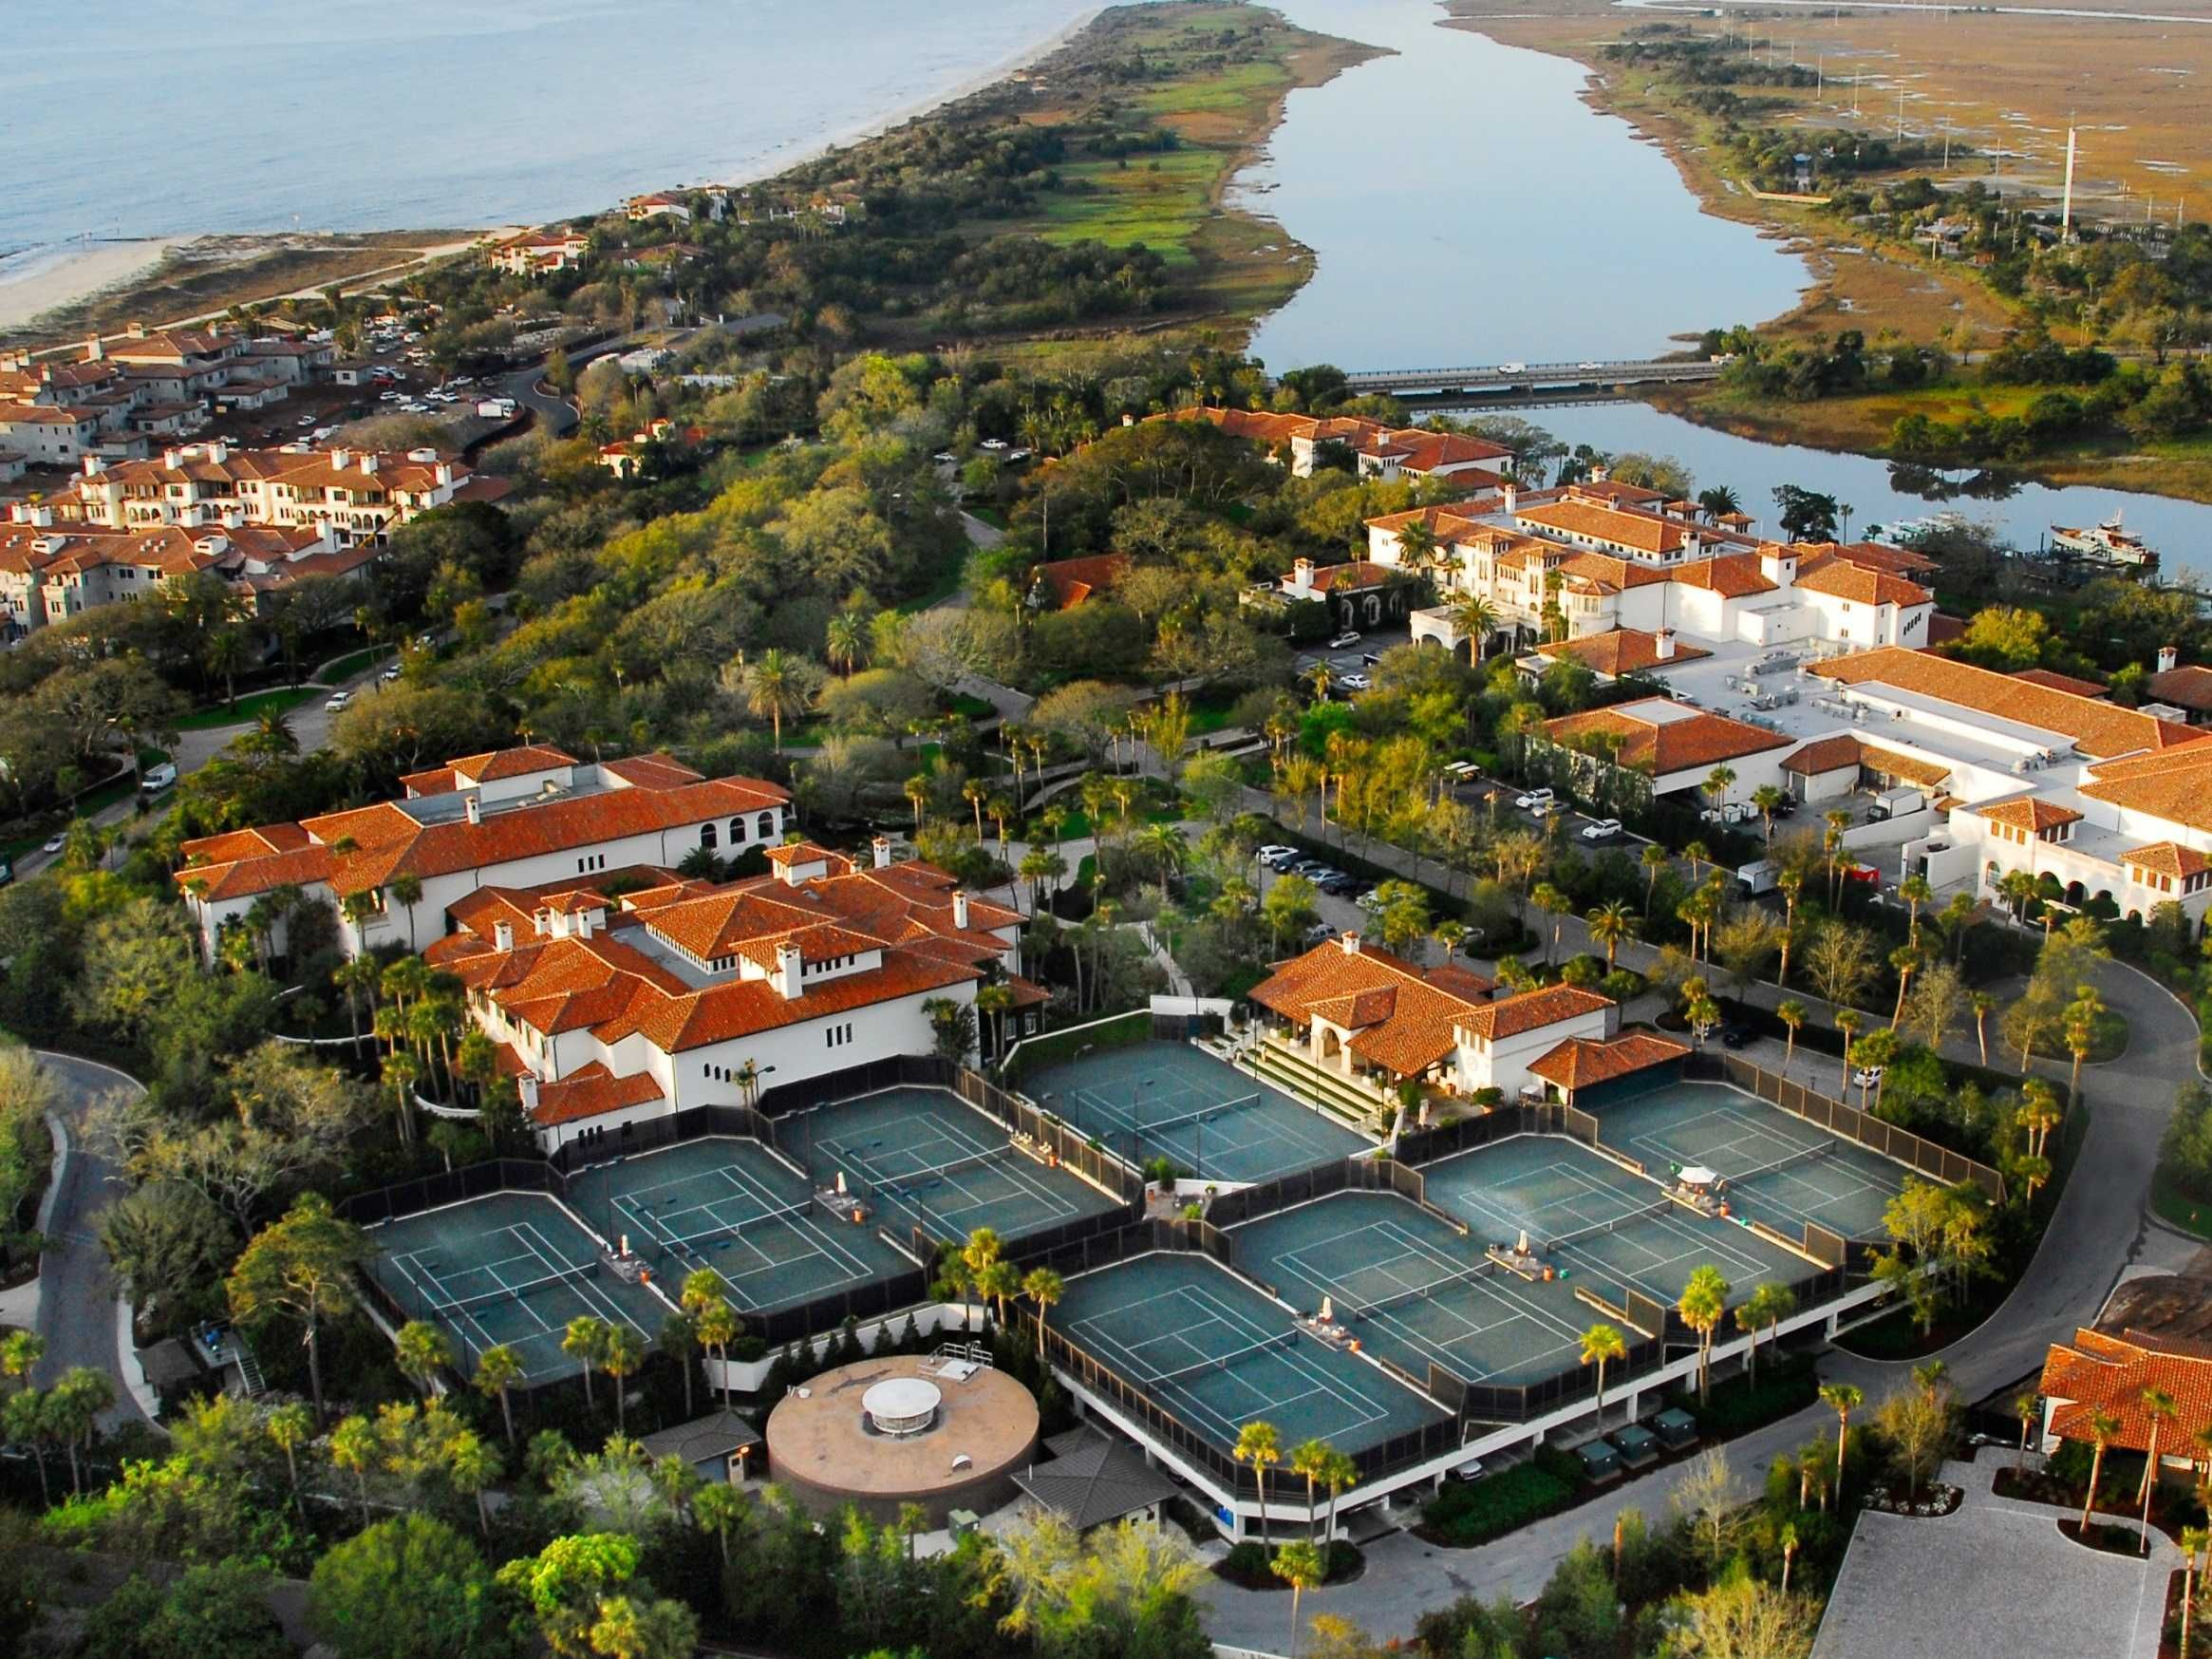 Tennis & Squash Courts In Tennis court, Tennis